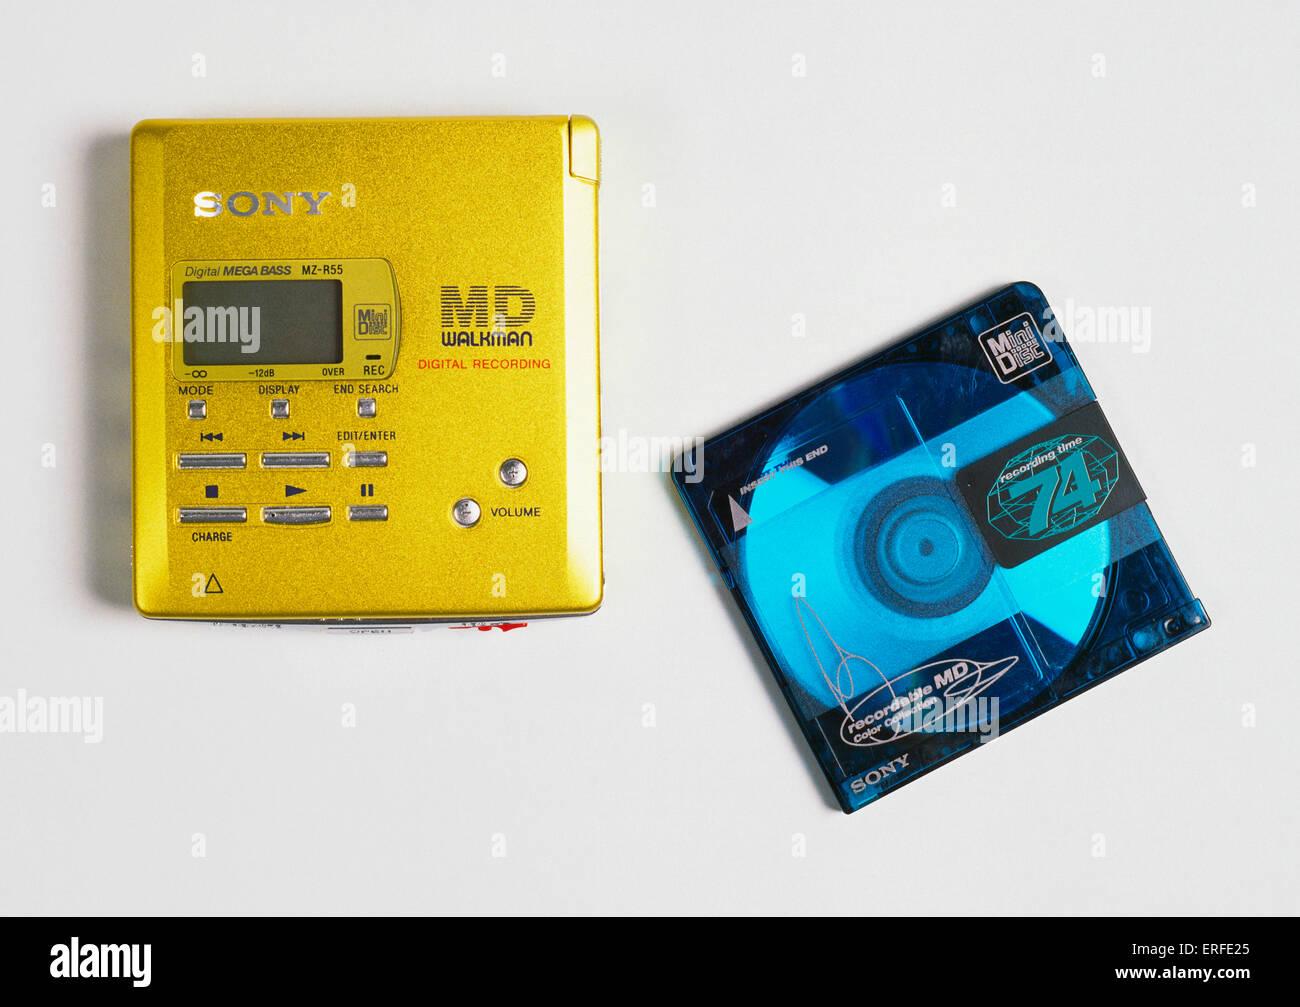 Sony minidisc player with minidisc  Portable music player